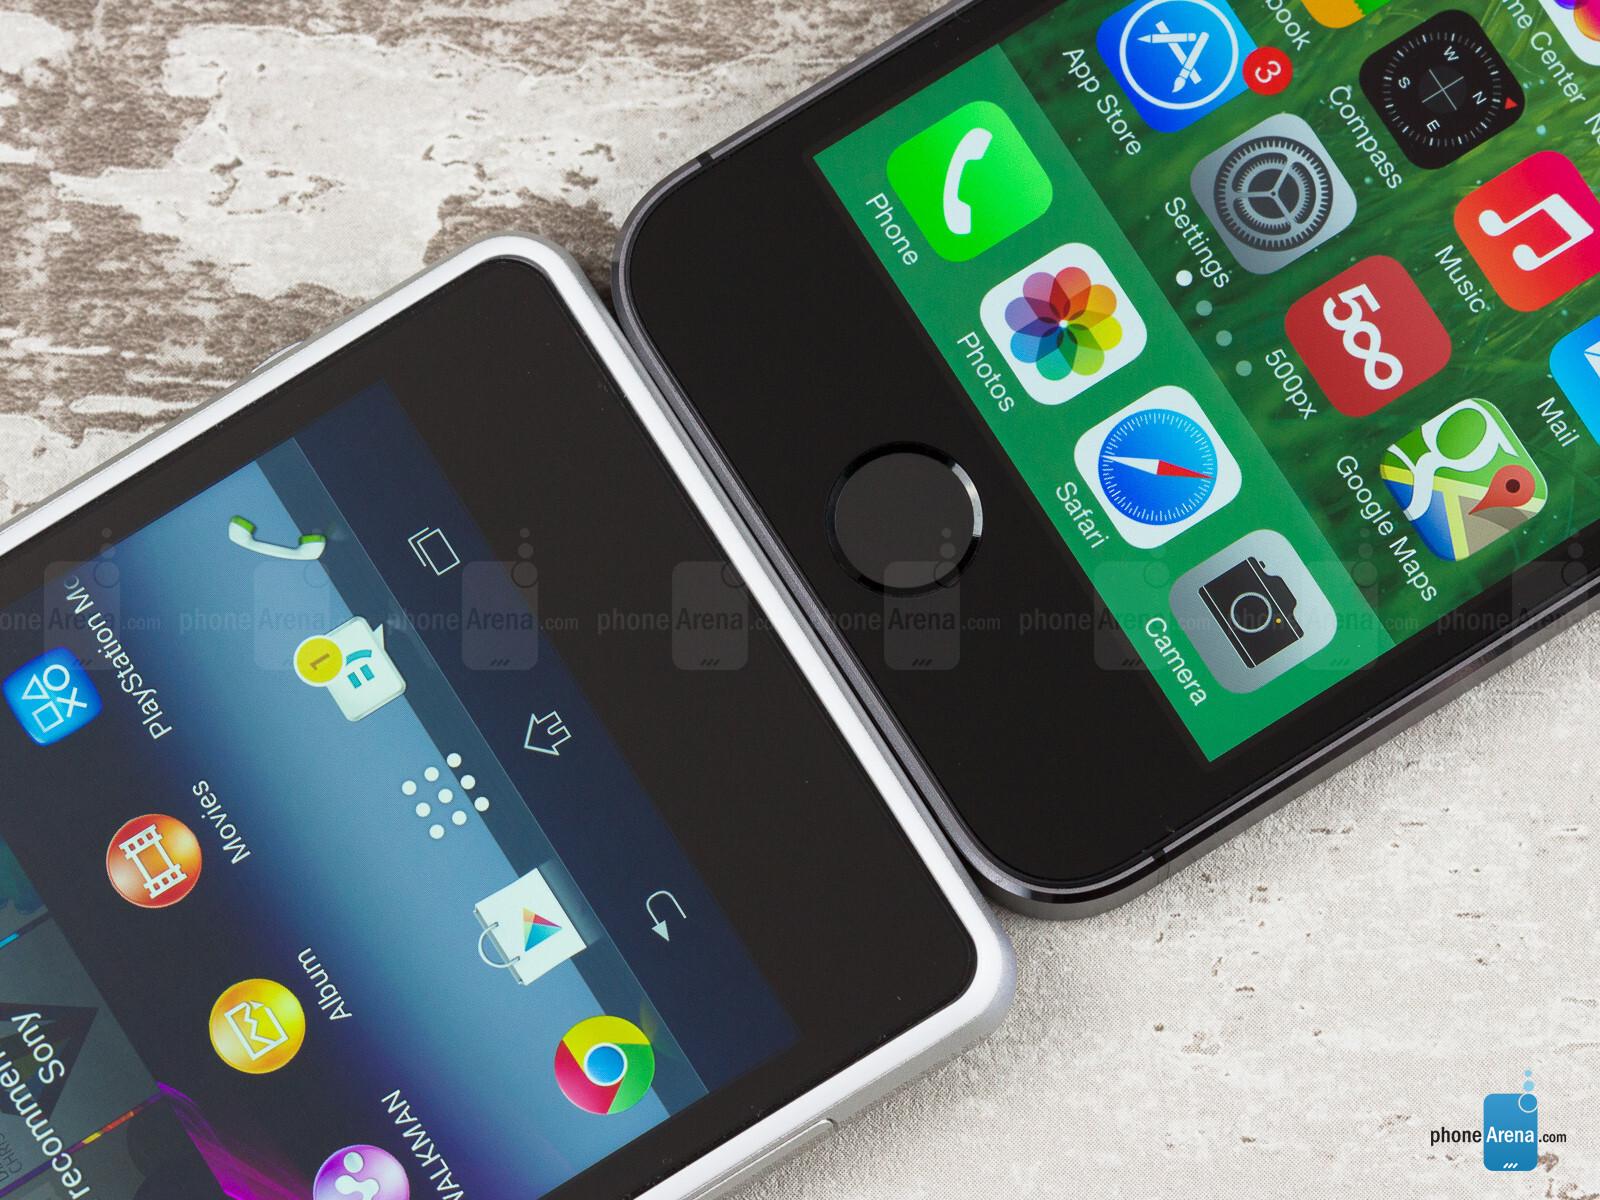 Sony Xperia Z1 Compact vs Apple iPhone 5s  Sony Xperia Z1 ...